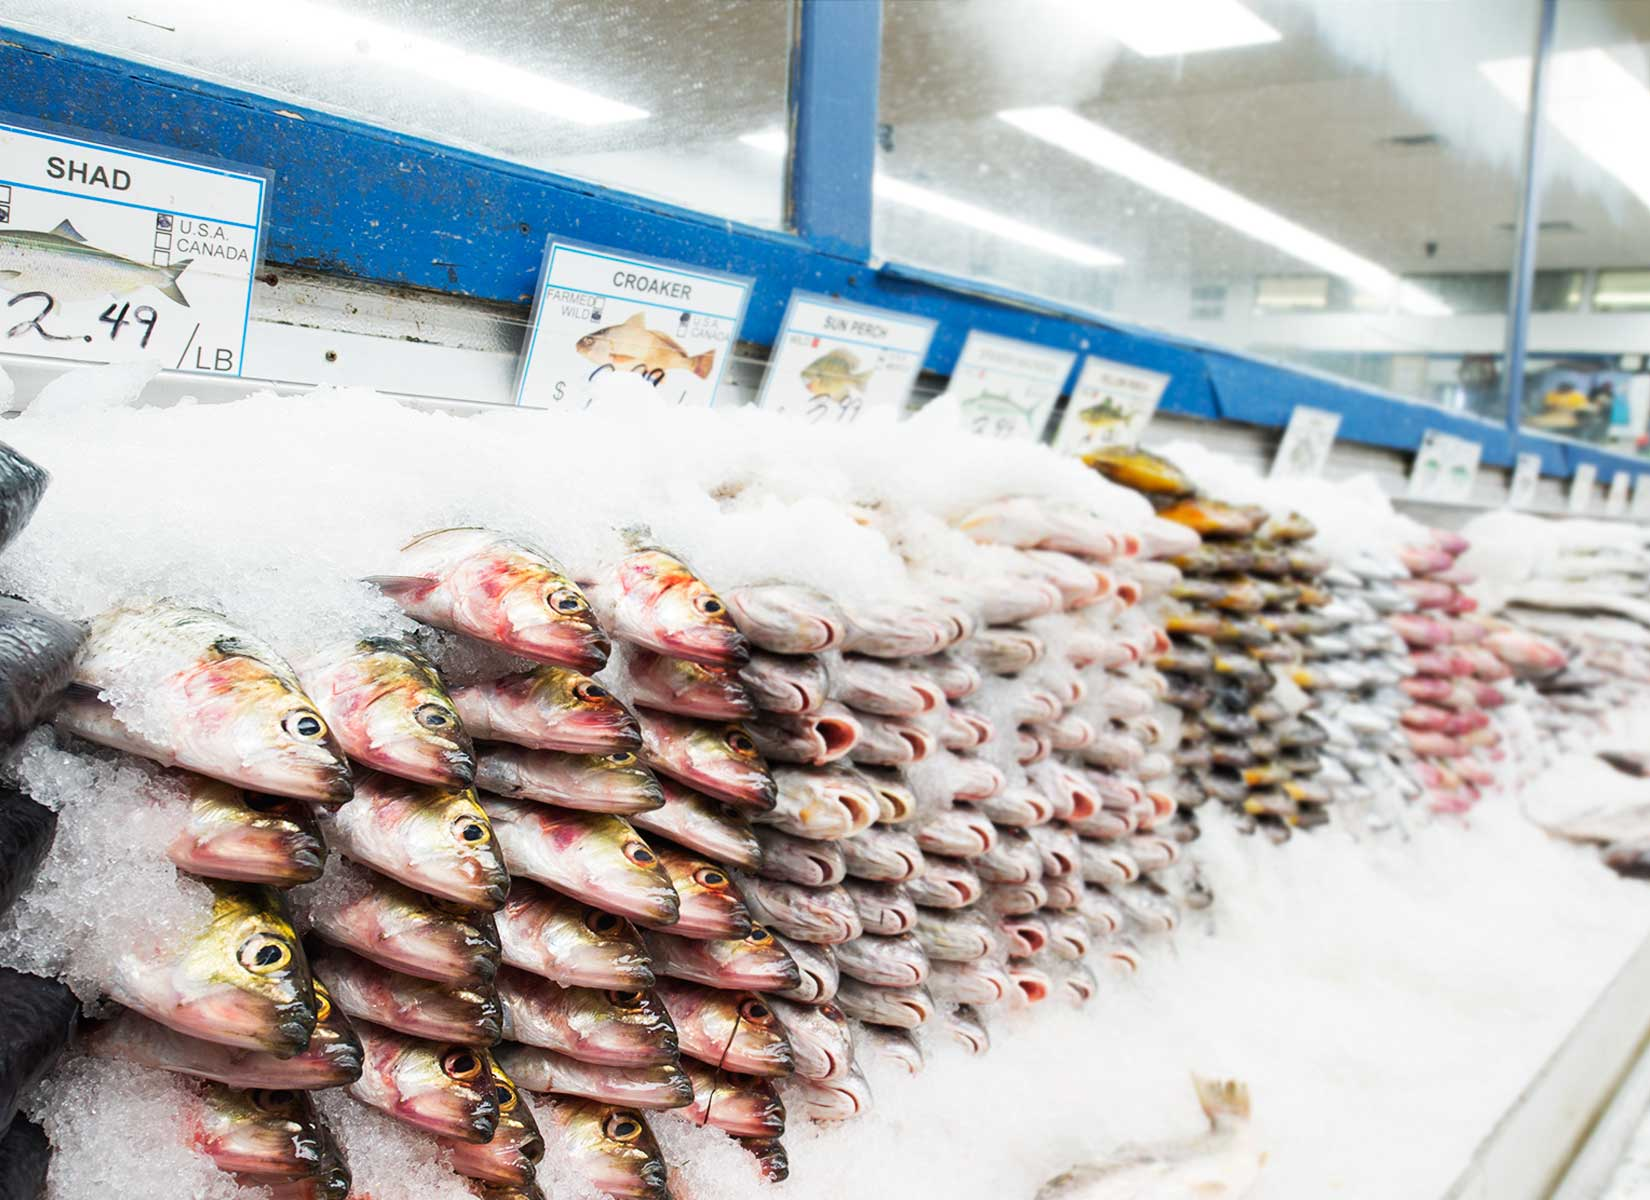 Sea and Sea Fish Market in Harlem